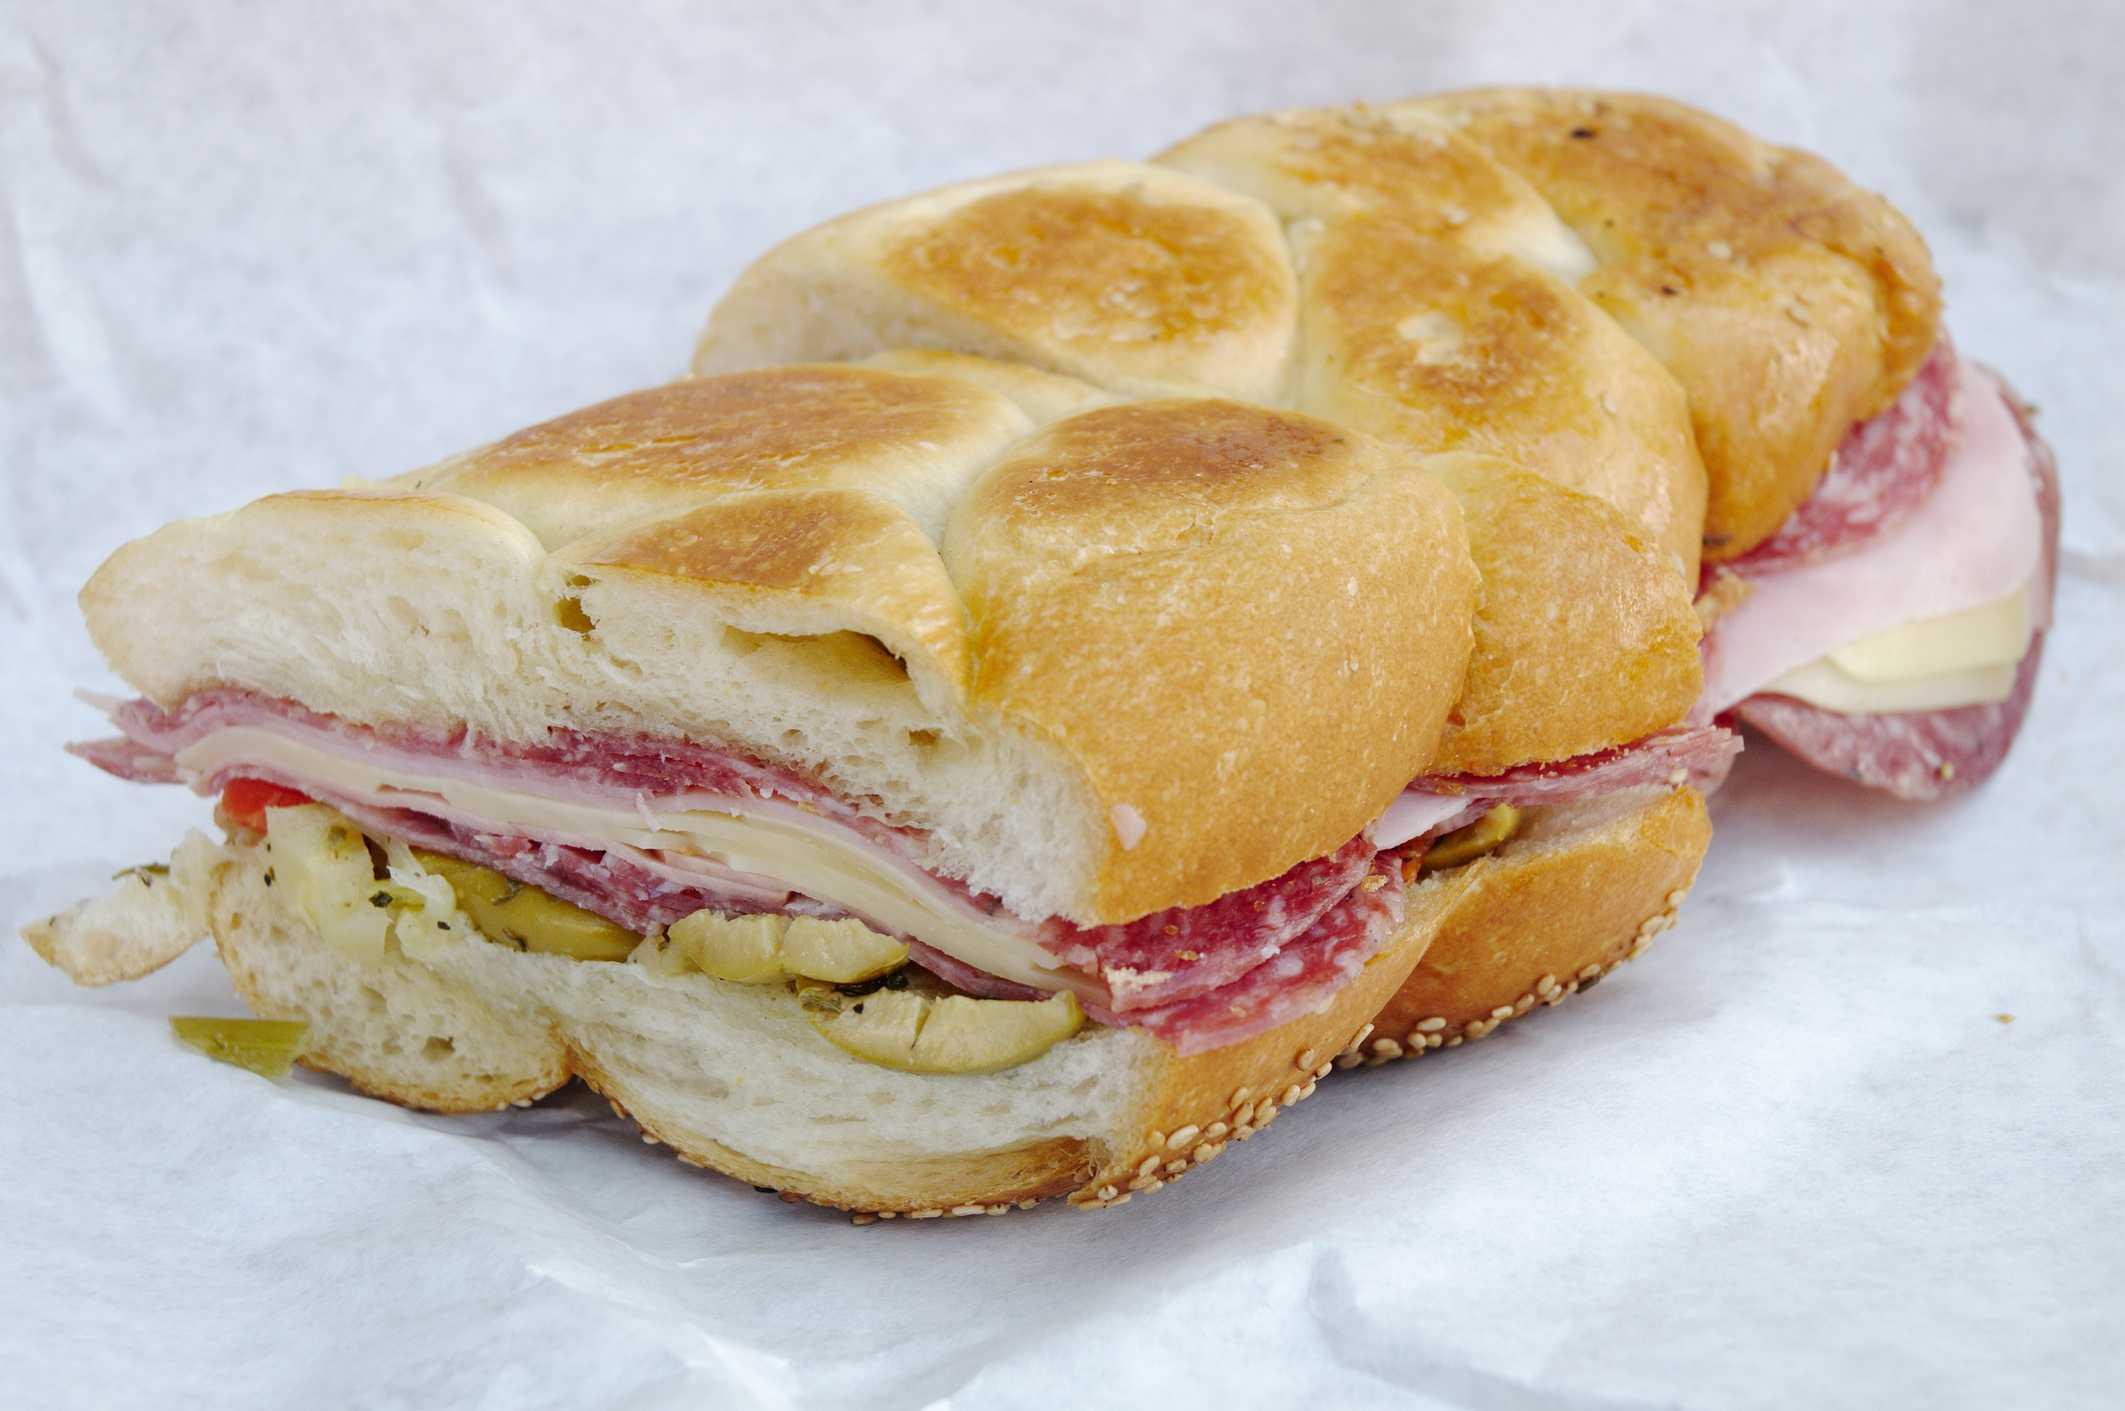 Half a muffuletta sandwich, stuffed with salami, mortadella, cheese, olives